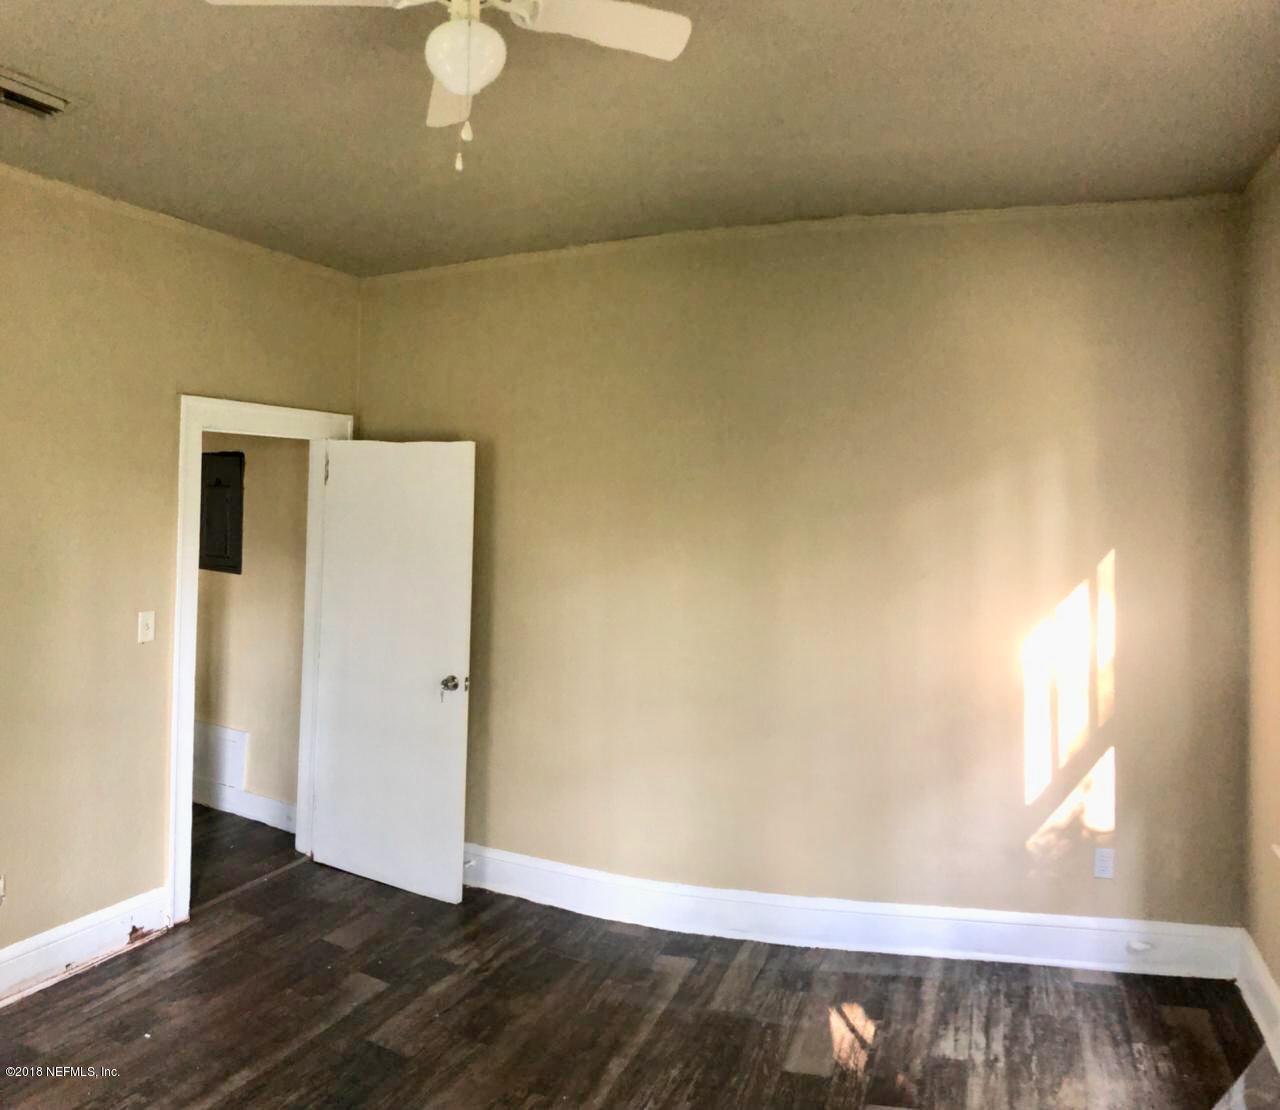 481 GOLFAIR, JACKSONVILLE, FLORIDA 32206, 3 Bedrooms Bedrooms, ,1 BathroomBathrooms,Residential - single family,For sale,GOLFAIR,949812